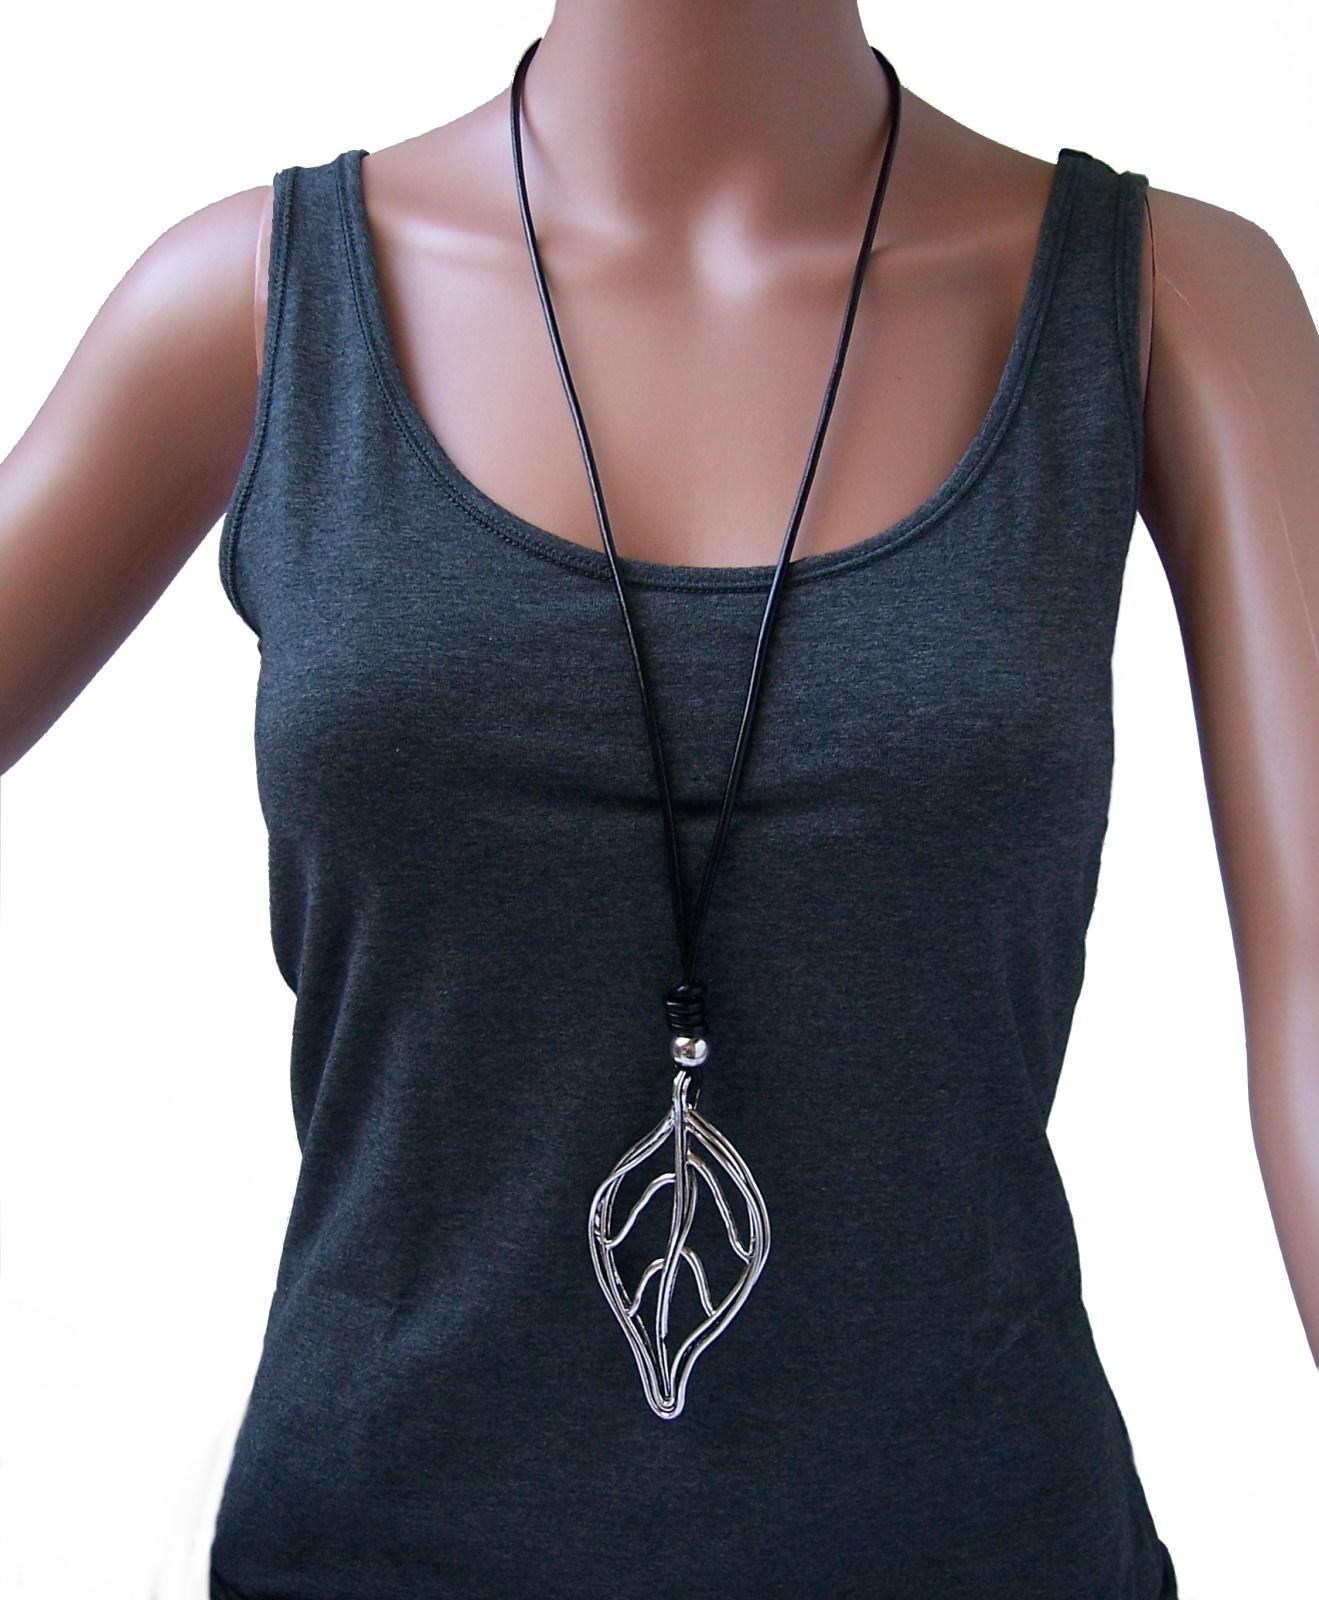 Kette lange Halskette Lederlook schwarz Blatt Anhänger silber K1201